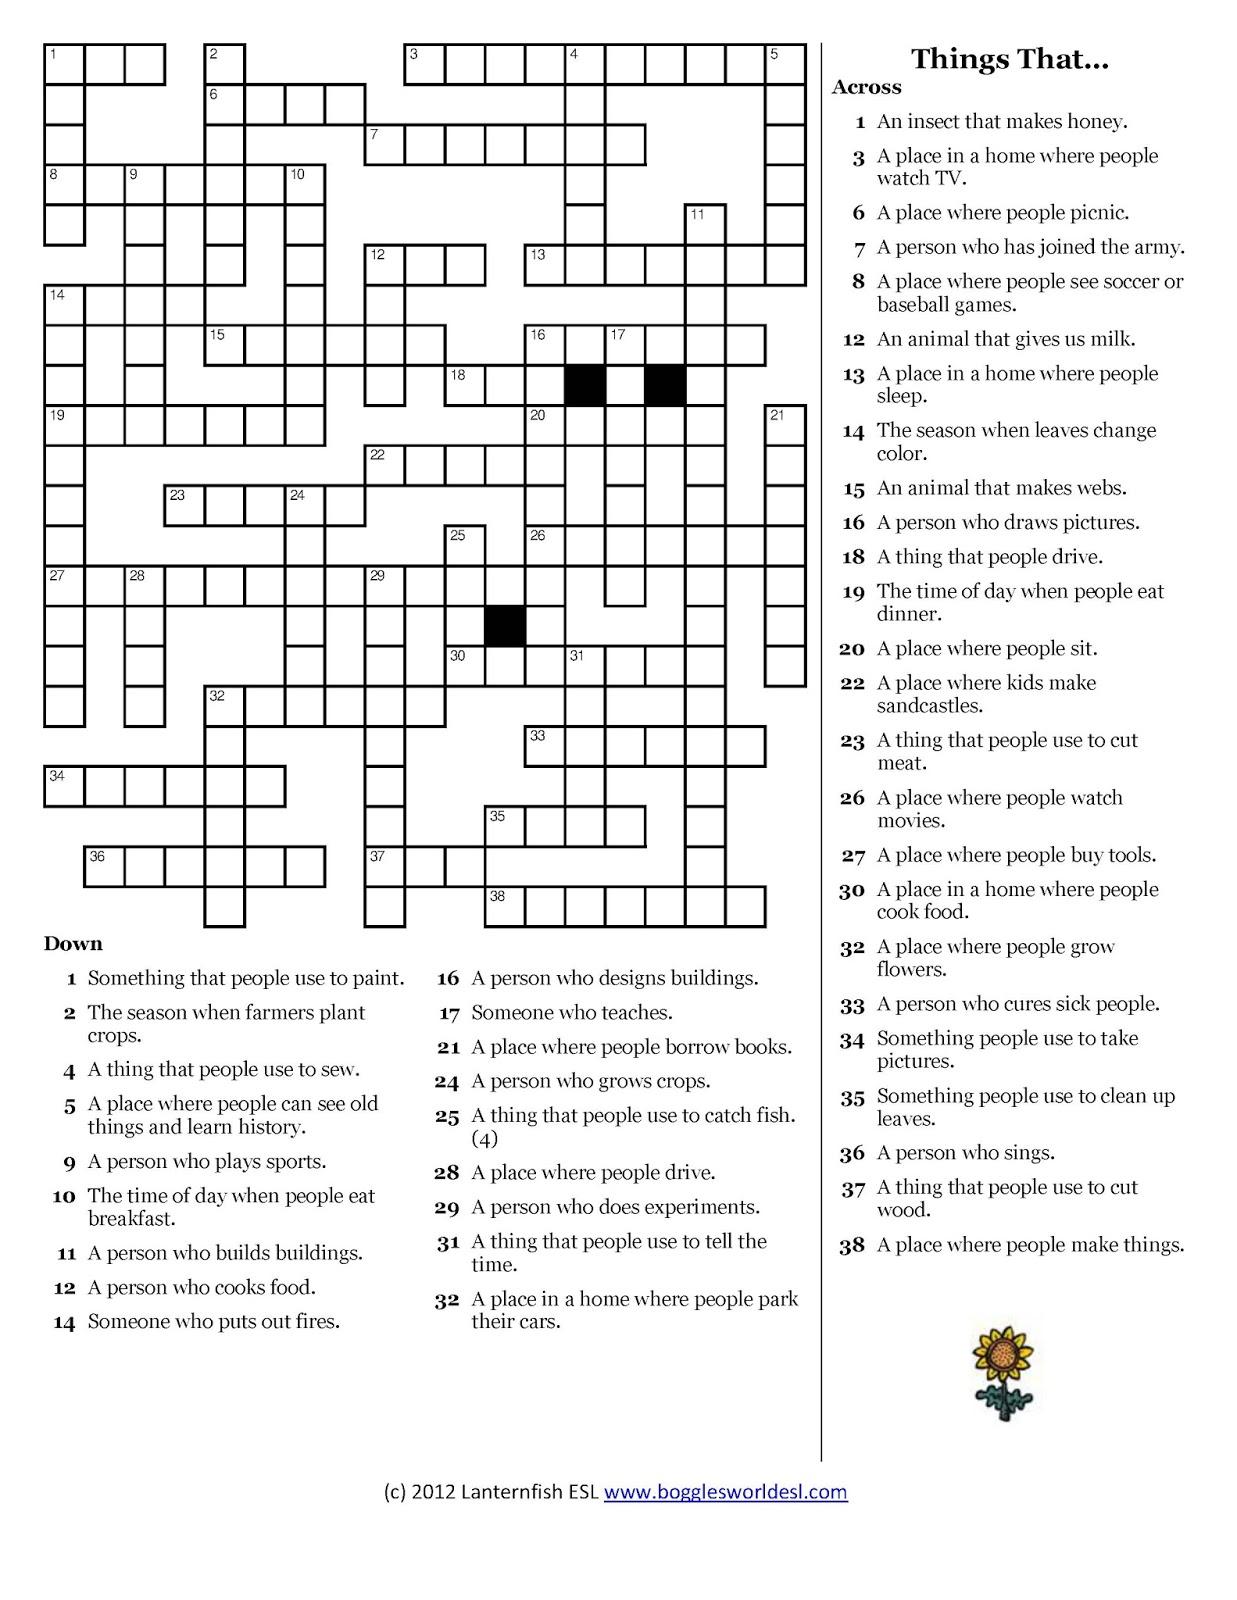 Grado 11 1 Relative Clauses Crossword Puzzle